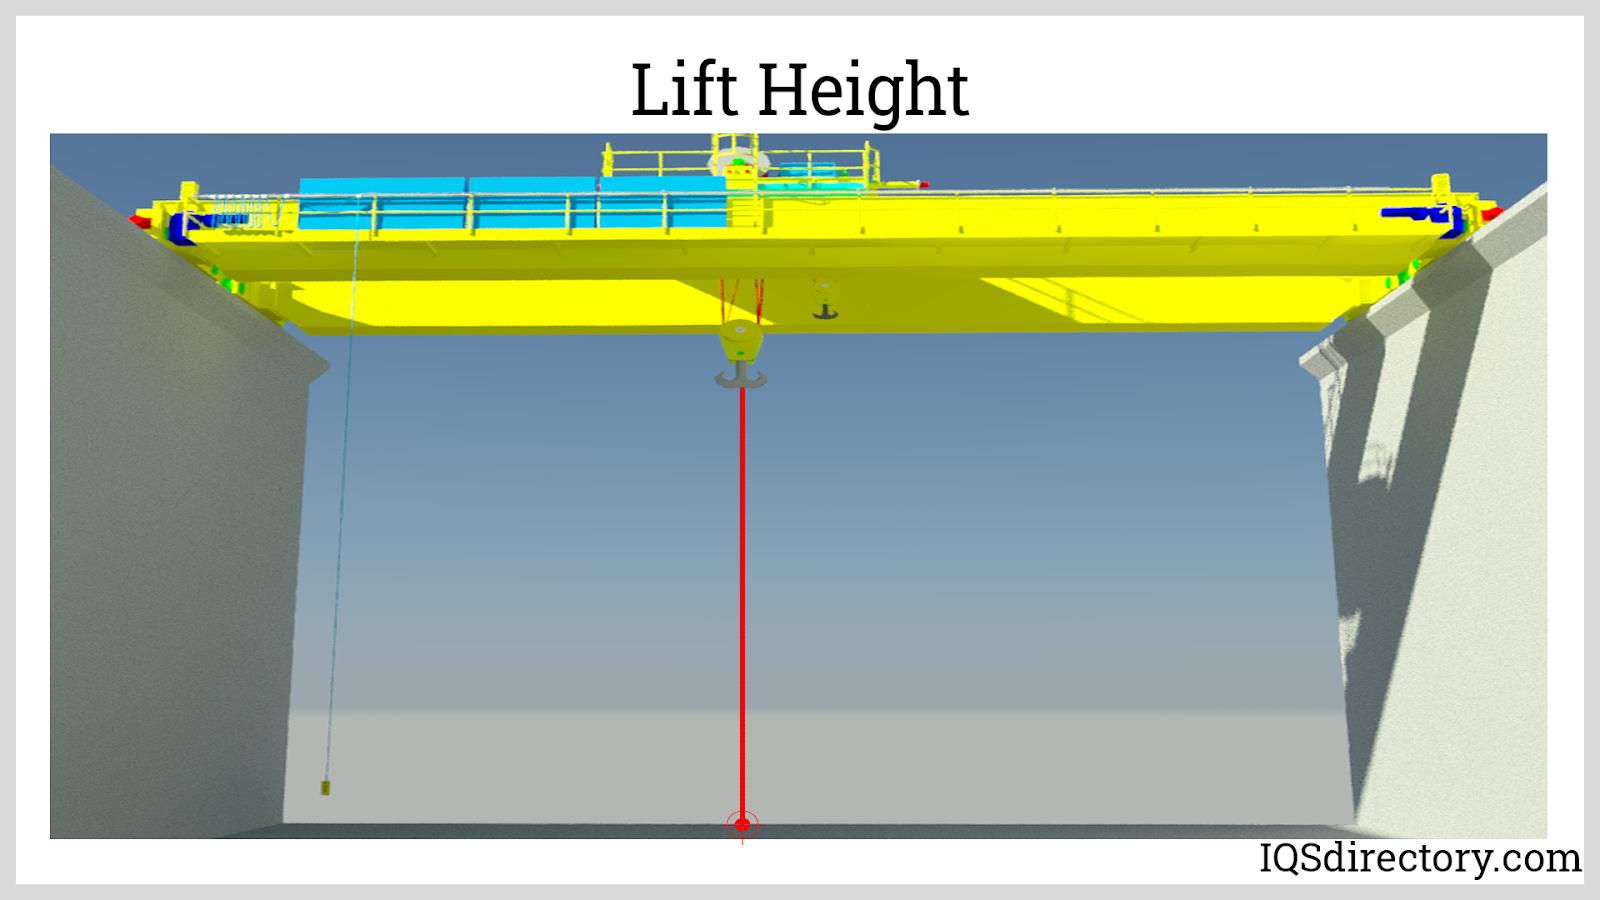 Lift Height